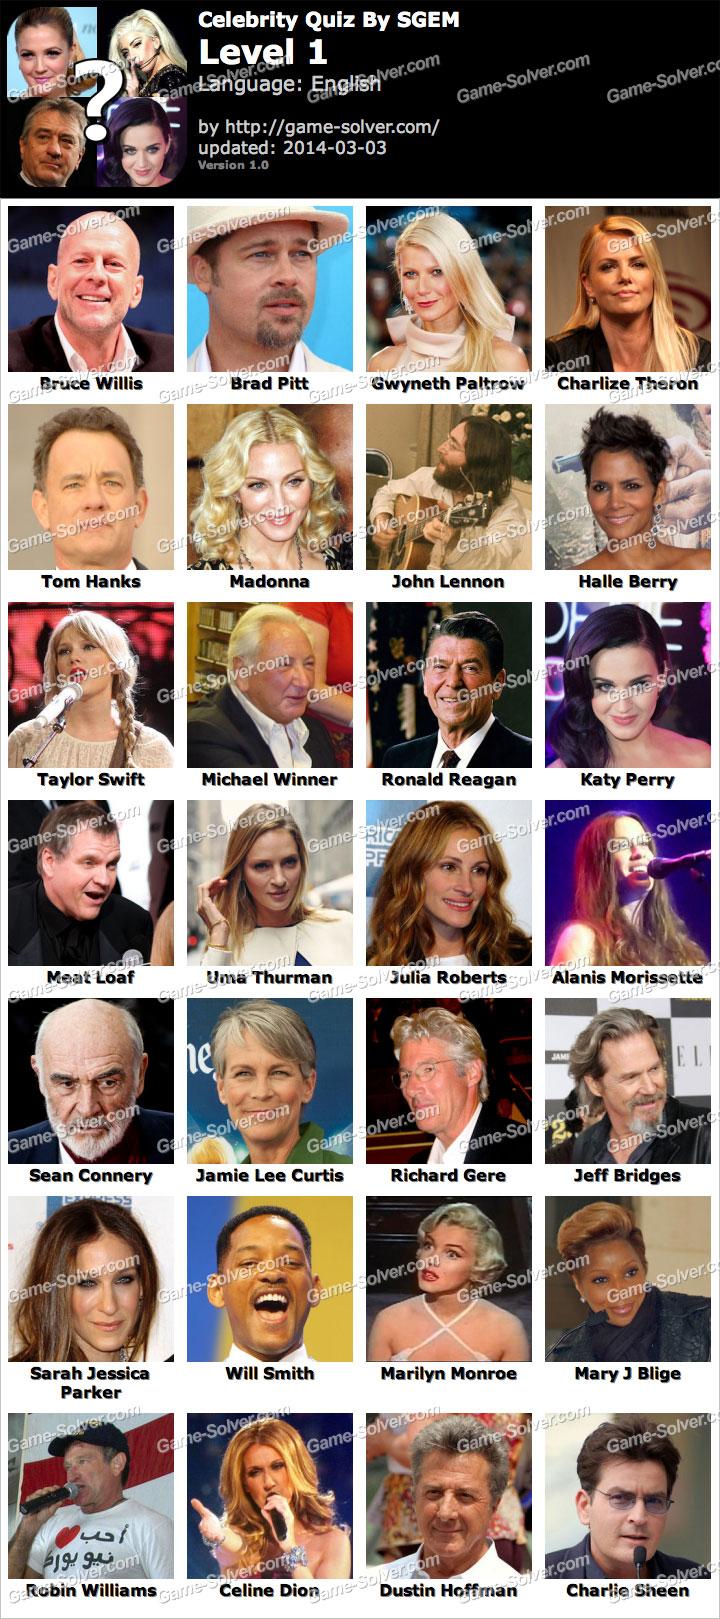 Celebrity Quiz by SGEM Level 1